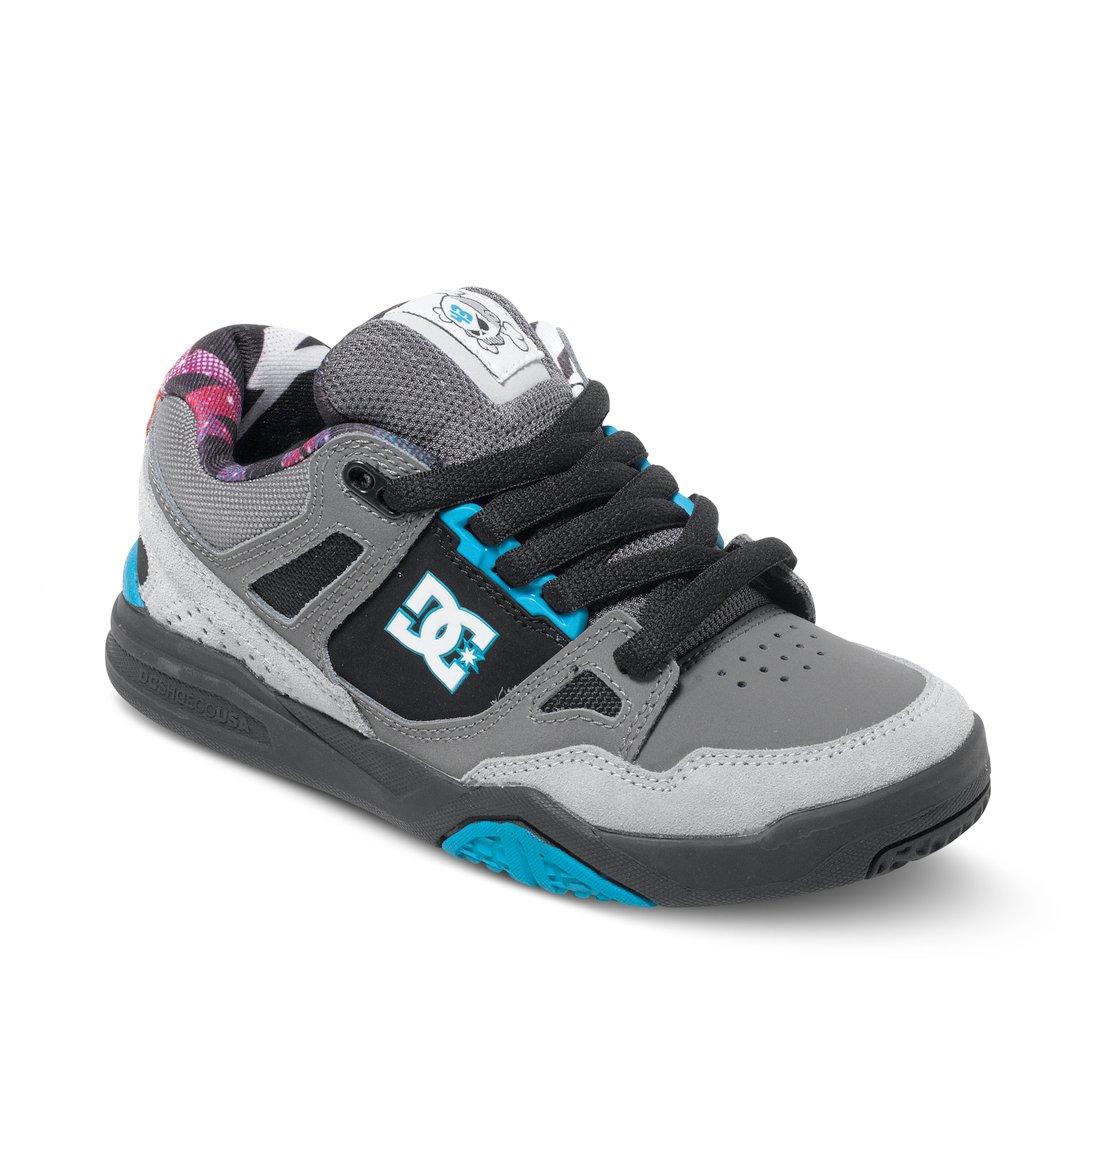 kid 39 s 4 7 stag 2 ken block shoes adbs100147 dc shoes. Black Bedroom Furniture Sets. Home Design Ideas